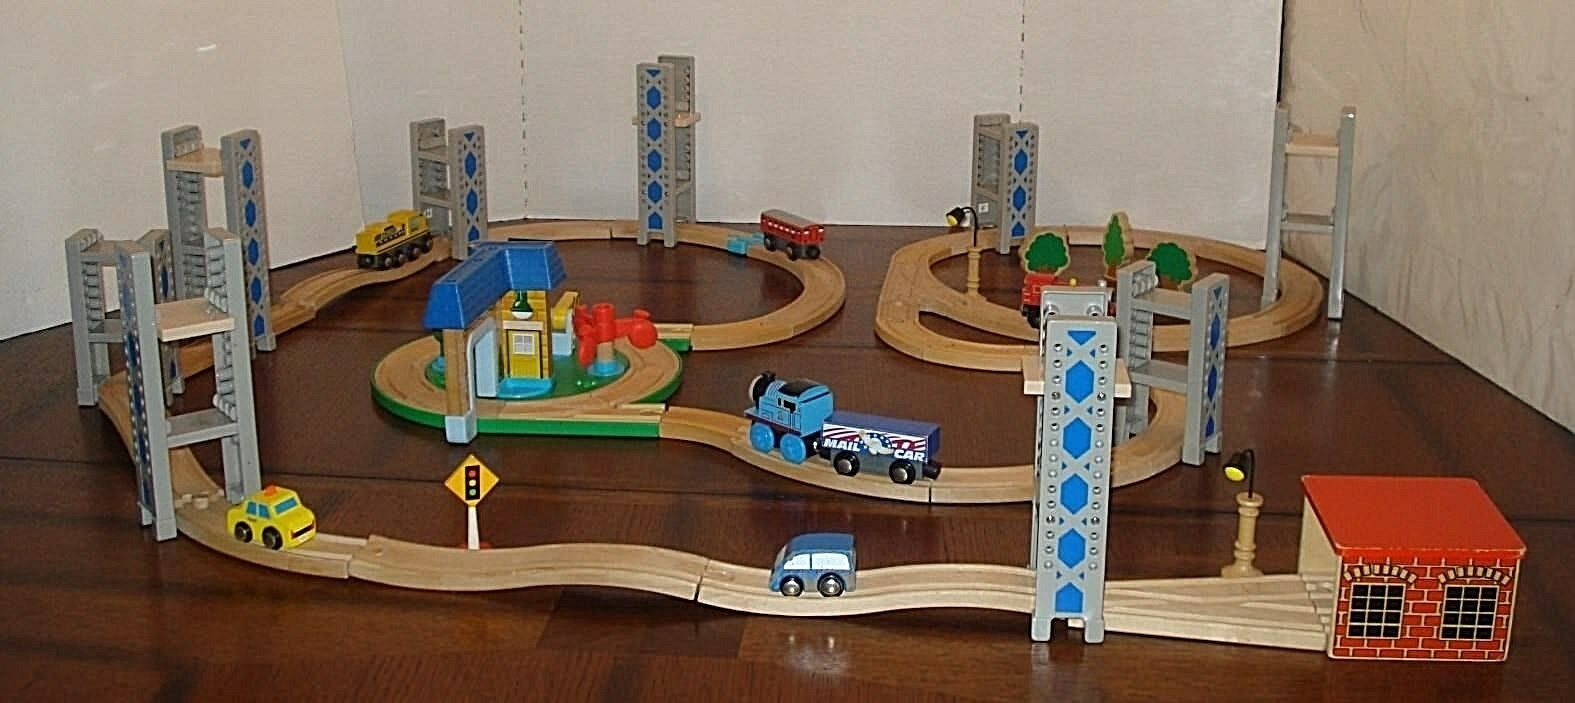 Vtg Thomas the Tank Engine Train Lot Toy Play Set roundabout Gullane